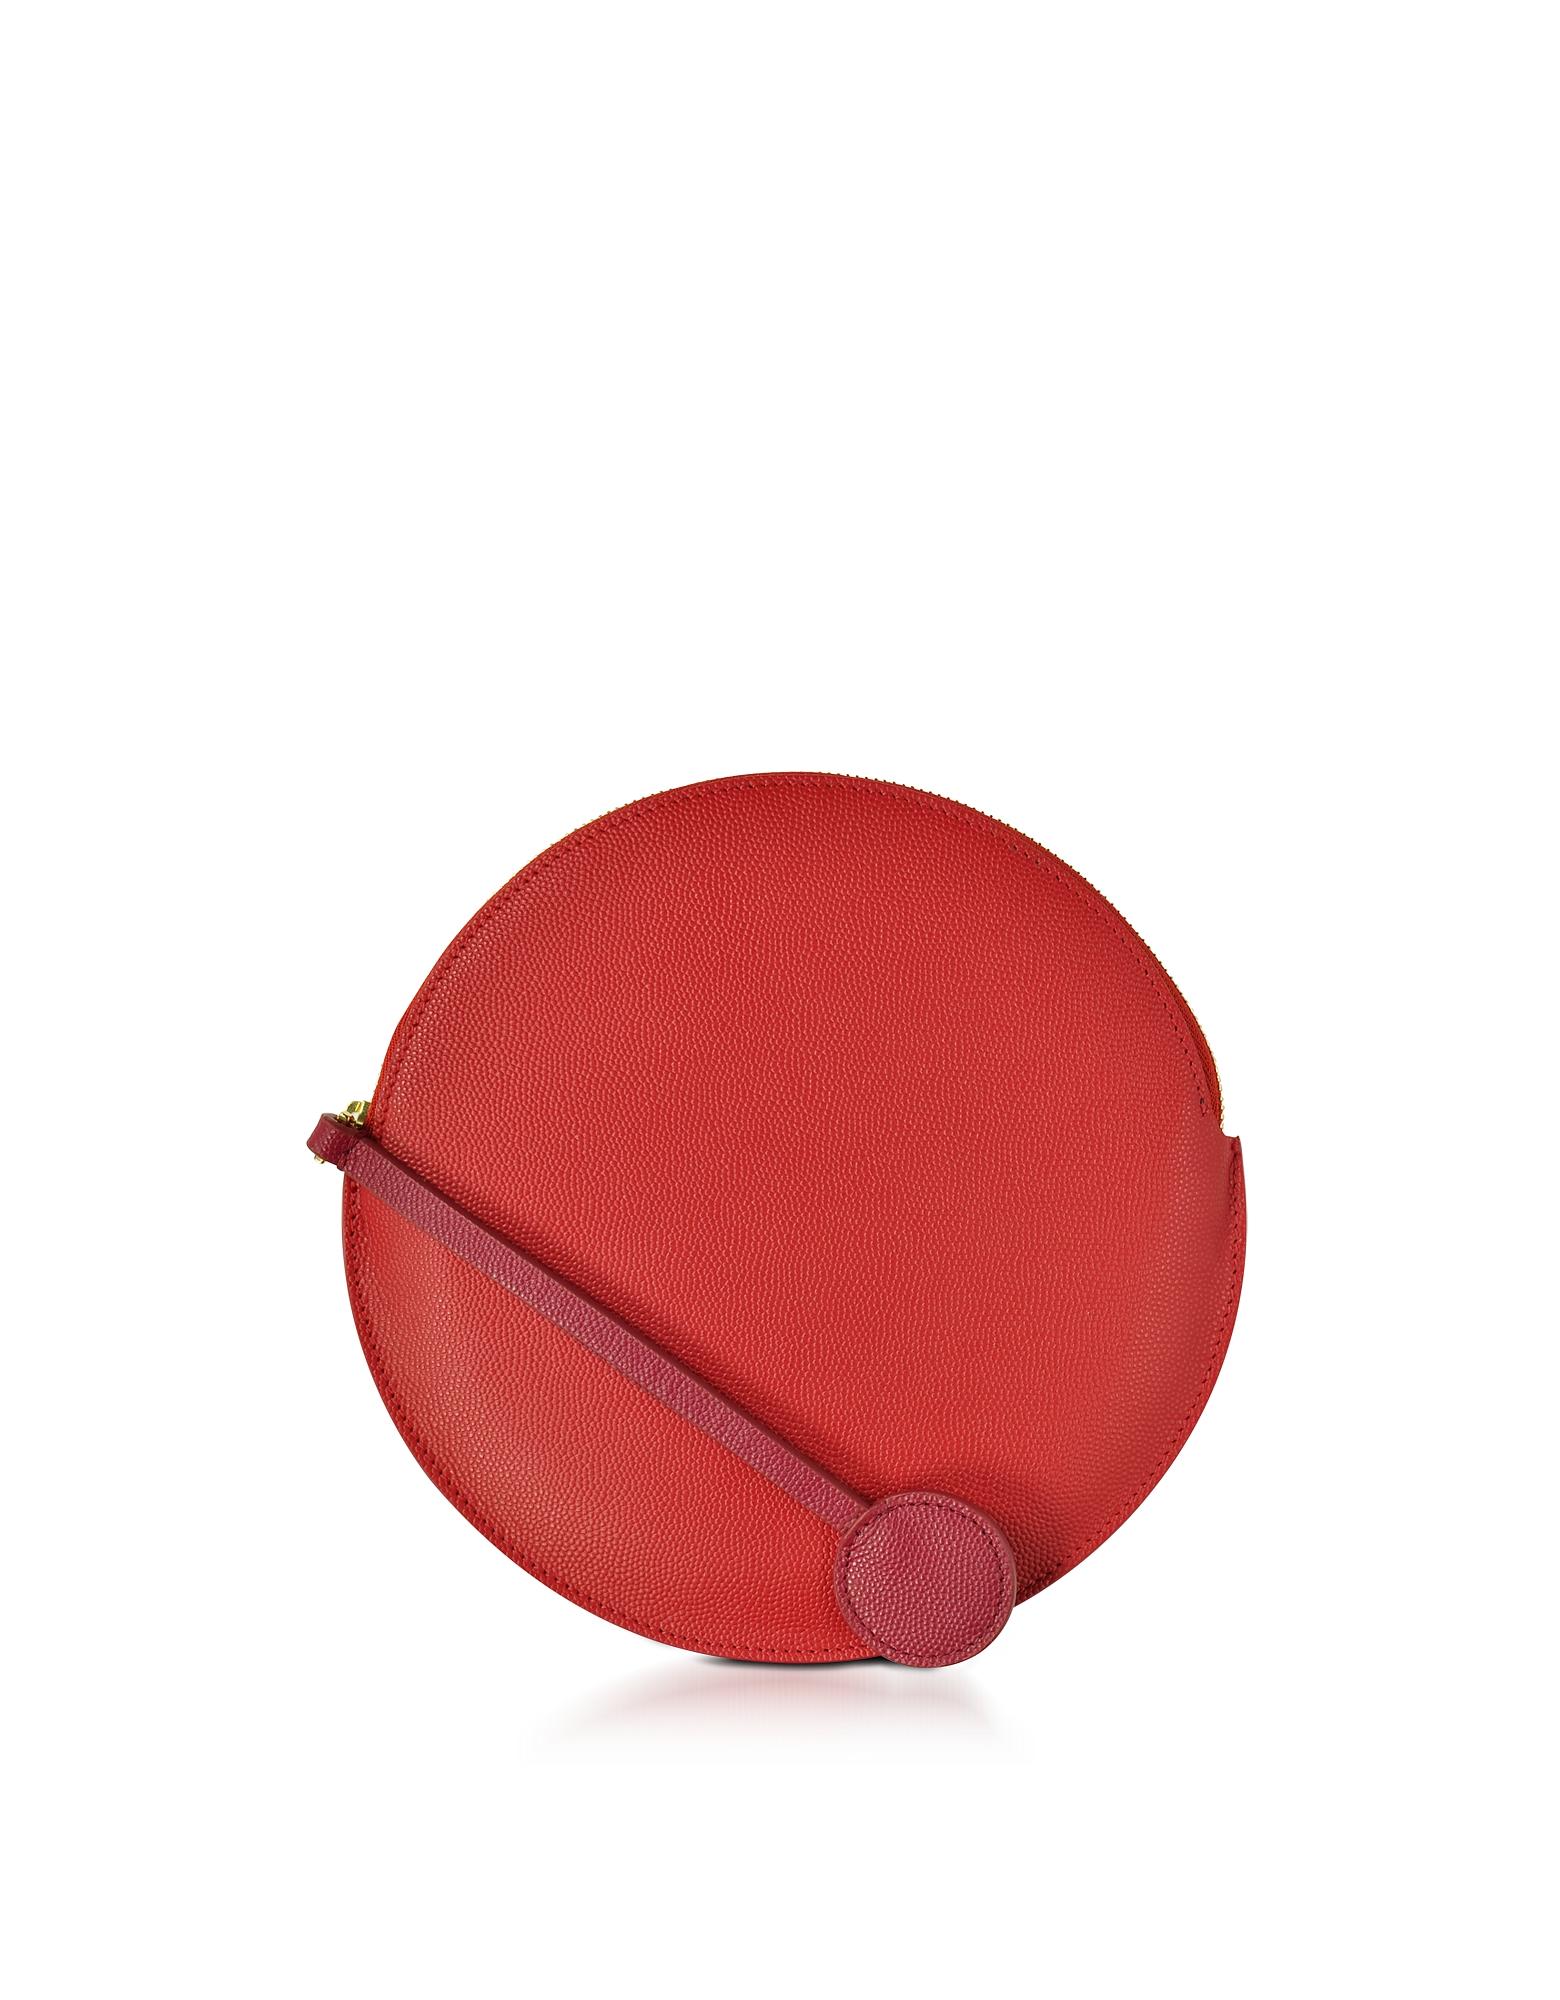 Roksanda Handbags, Red Leather Round Clutch